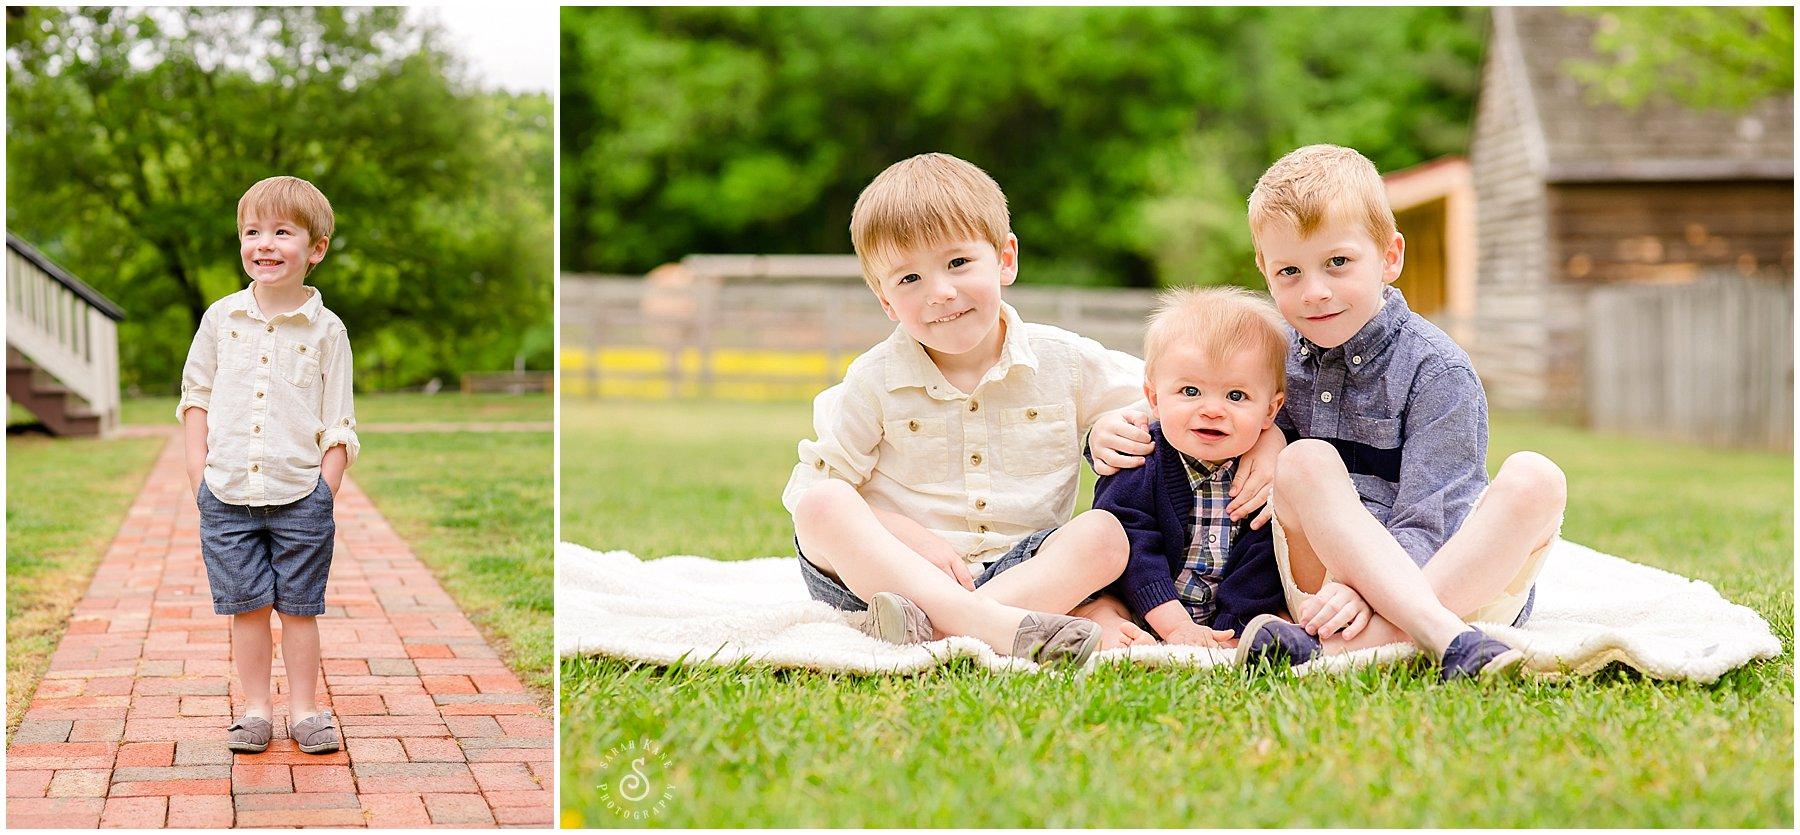 Hill family portraits 067.jpg